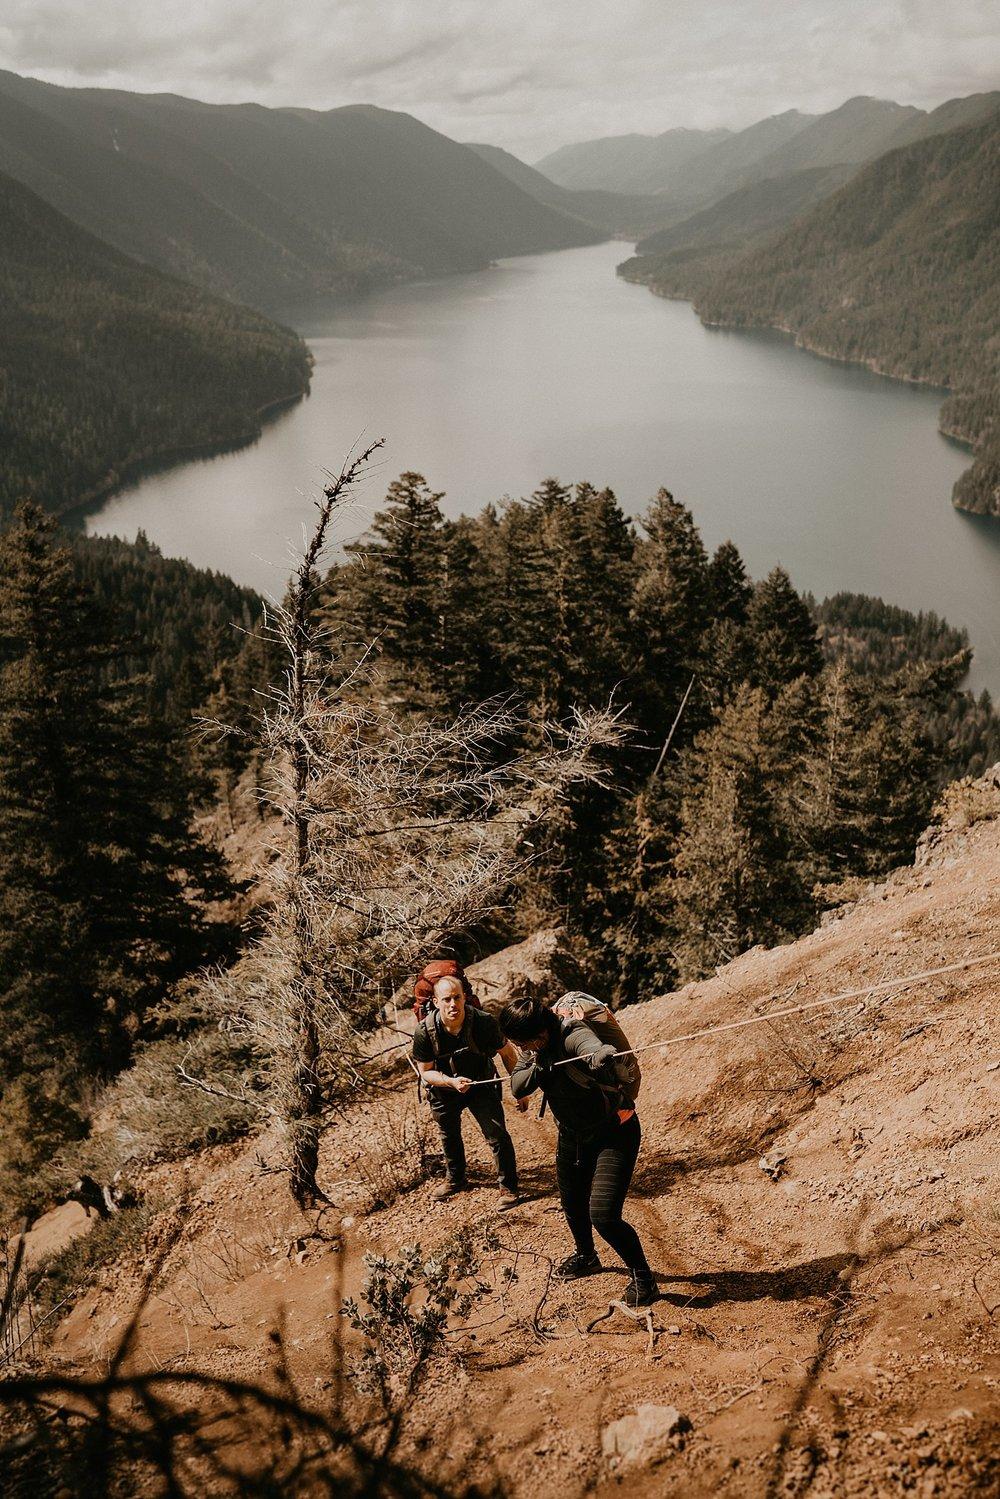 Lake-Crescent-Mount-Storm-King-Hiking-Adventure-Engagement-Seattle-Wedding-Photographer_0027.jpg